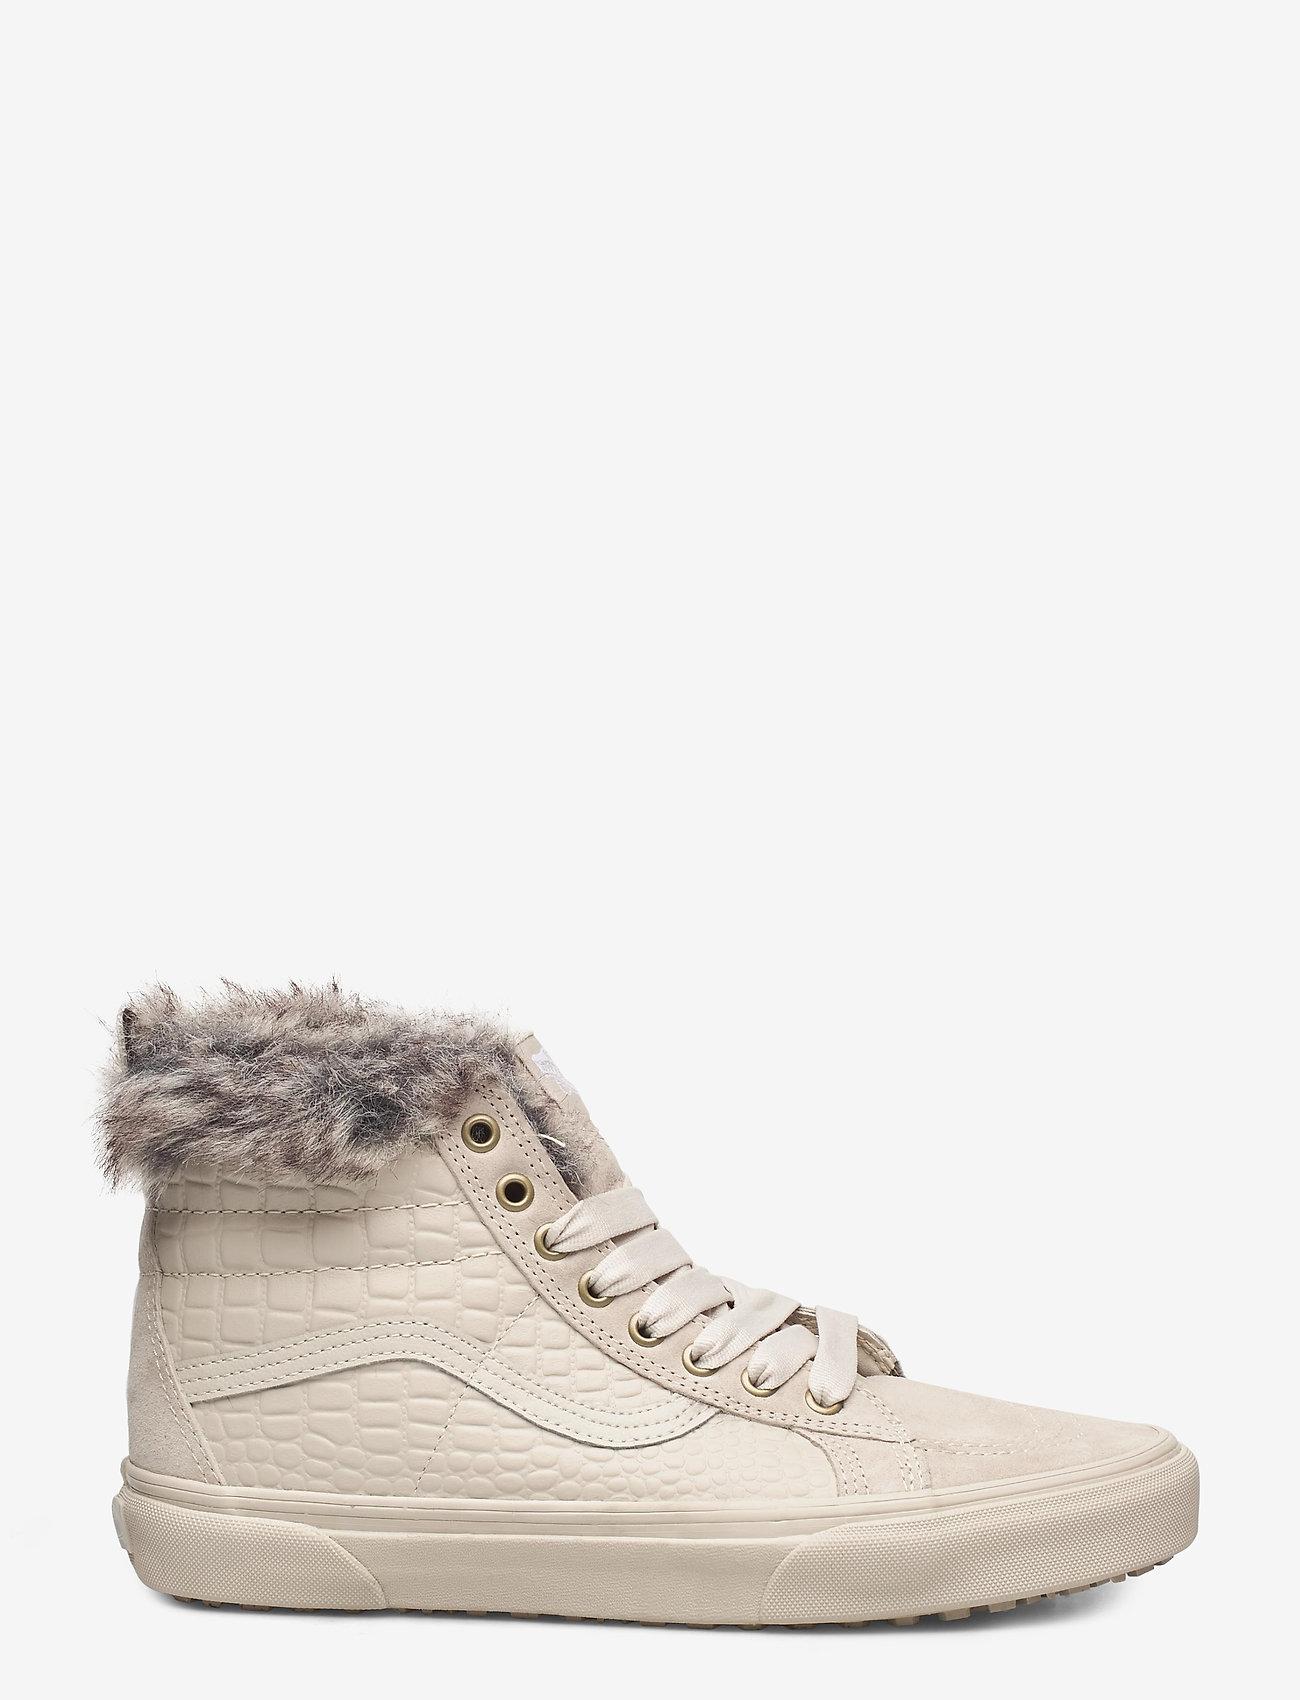 VANS - UA SK8-Hi MTE - hoge sneakers - (croc mte)oatmeal/oatmeal - 1